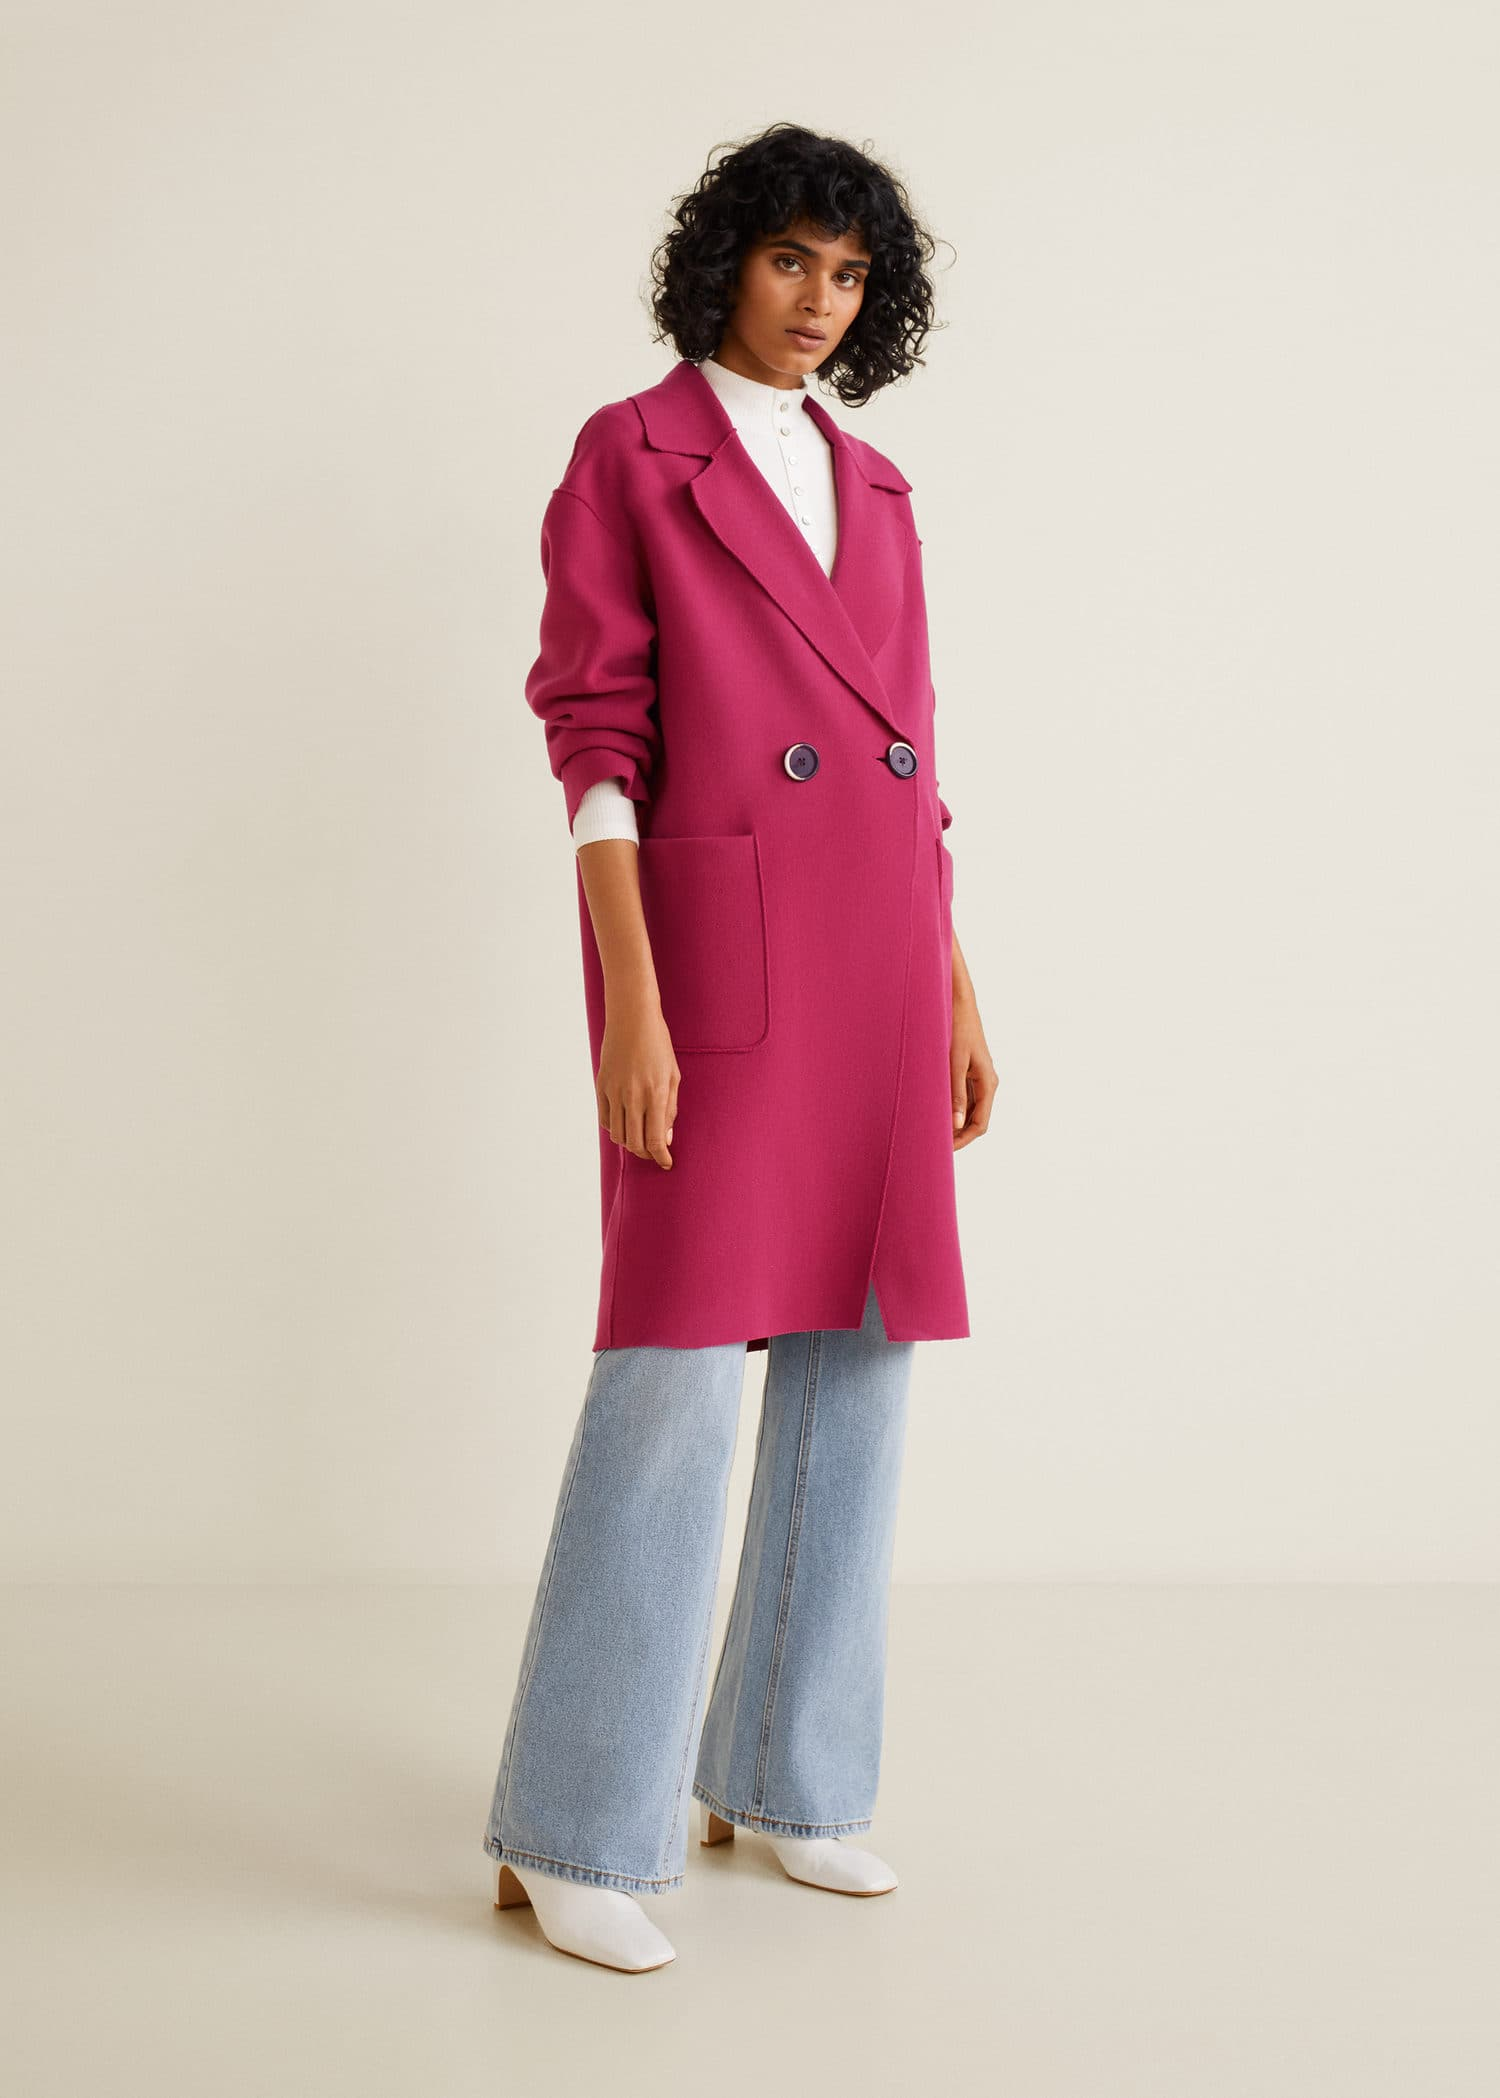 Comprar abrigo marinero mujer